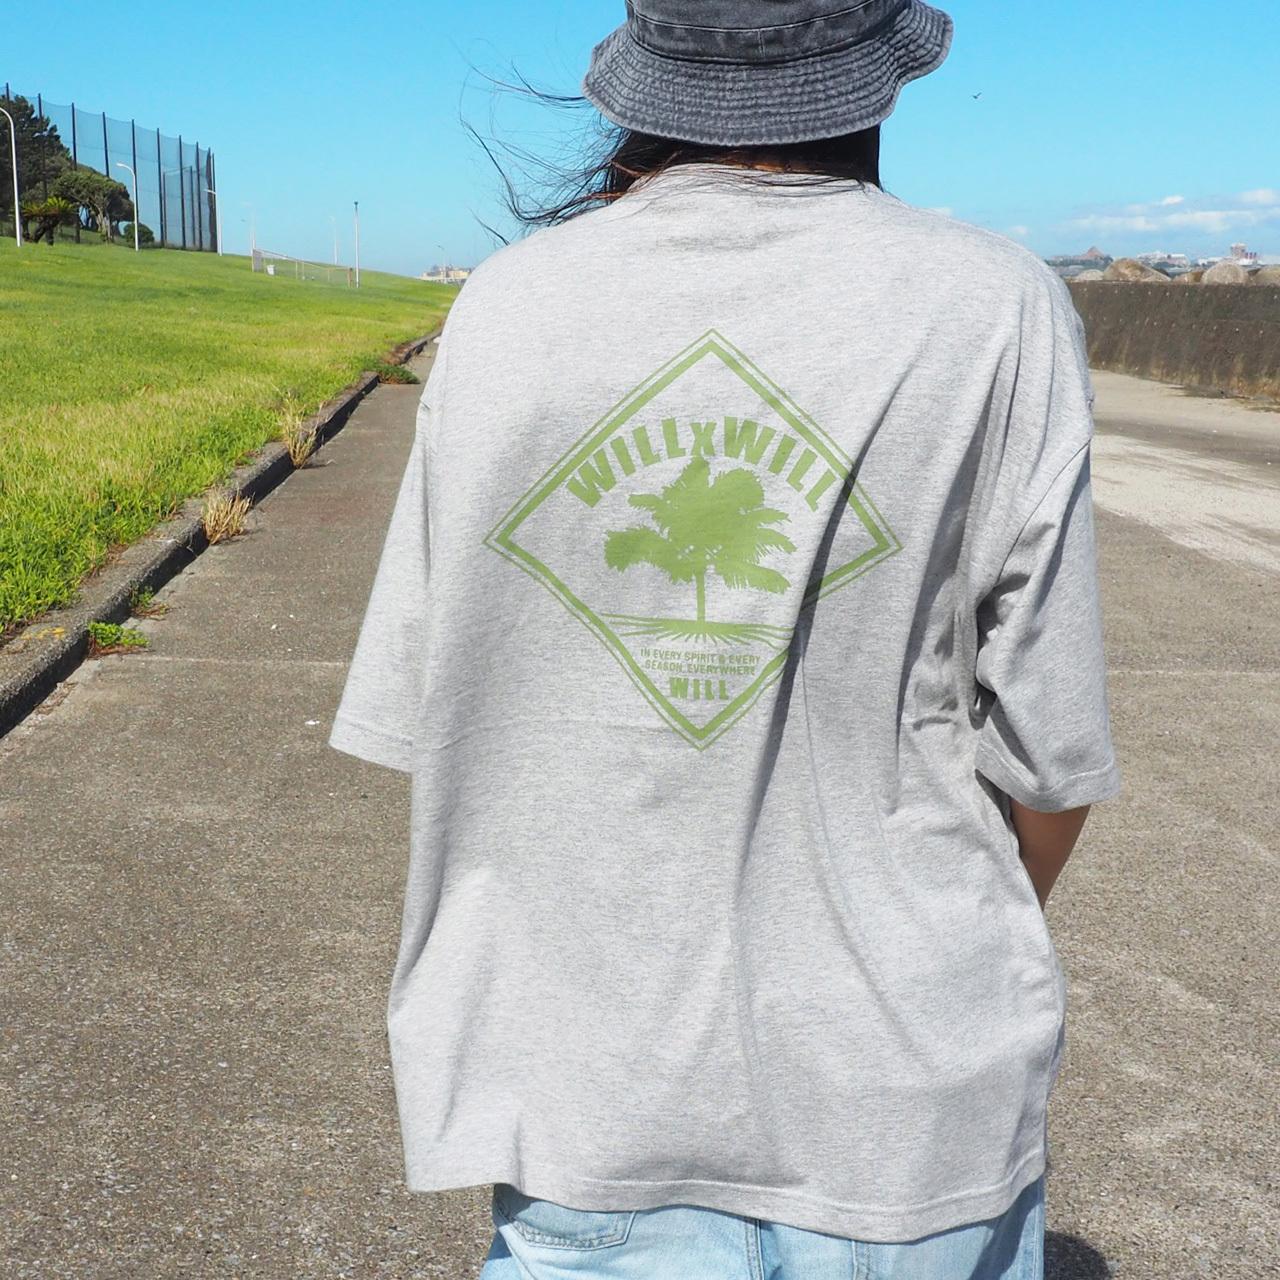 WillxWill WILLLAND Big Silhouette T-shirts Gray